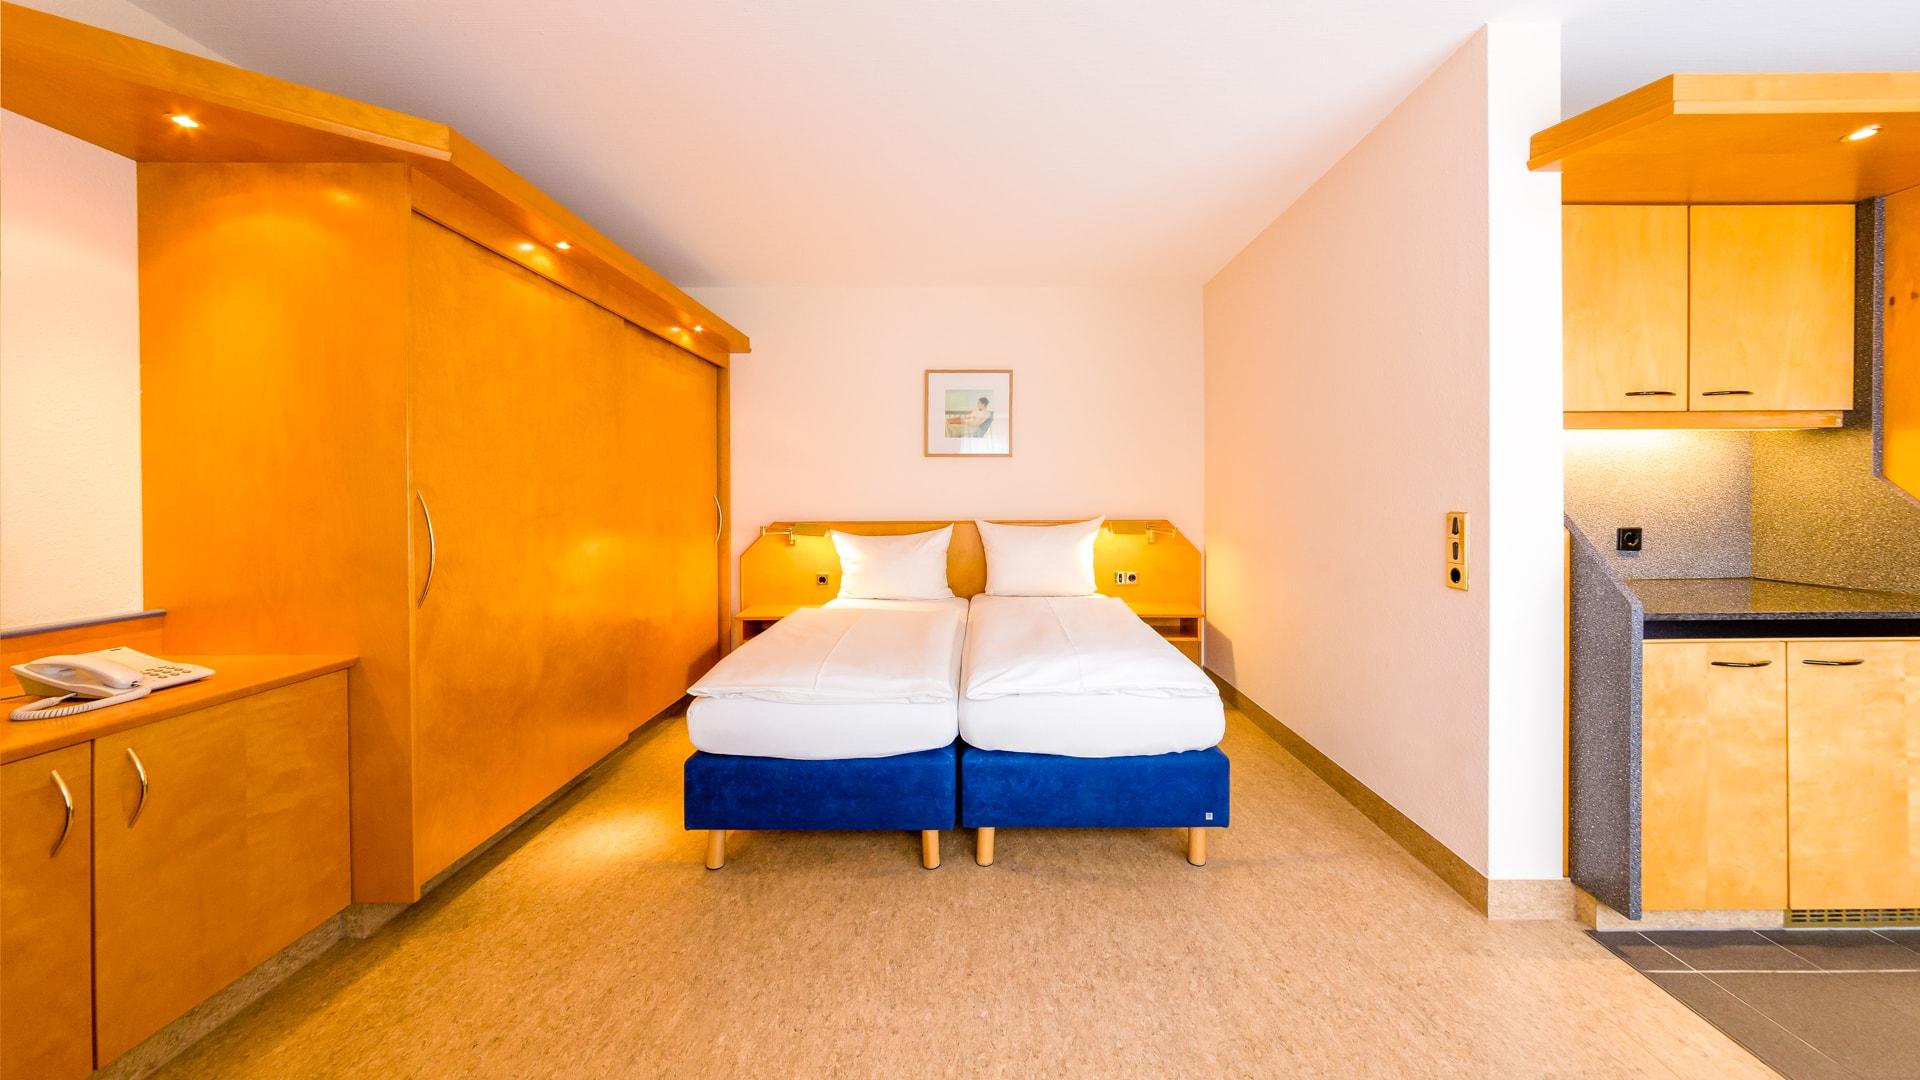 9 Michels_Hotels_Aparthotel_Norderney_Doppelzimmer_Comfort